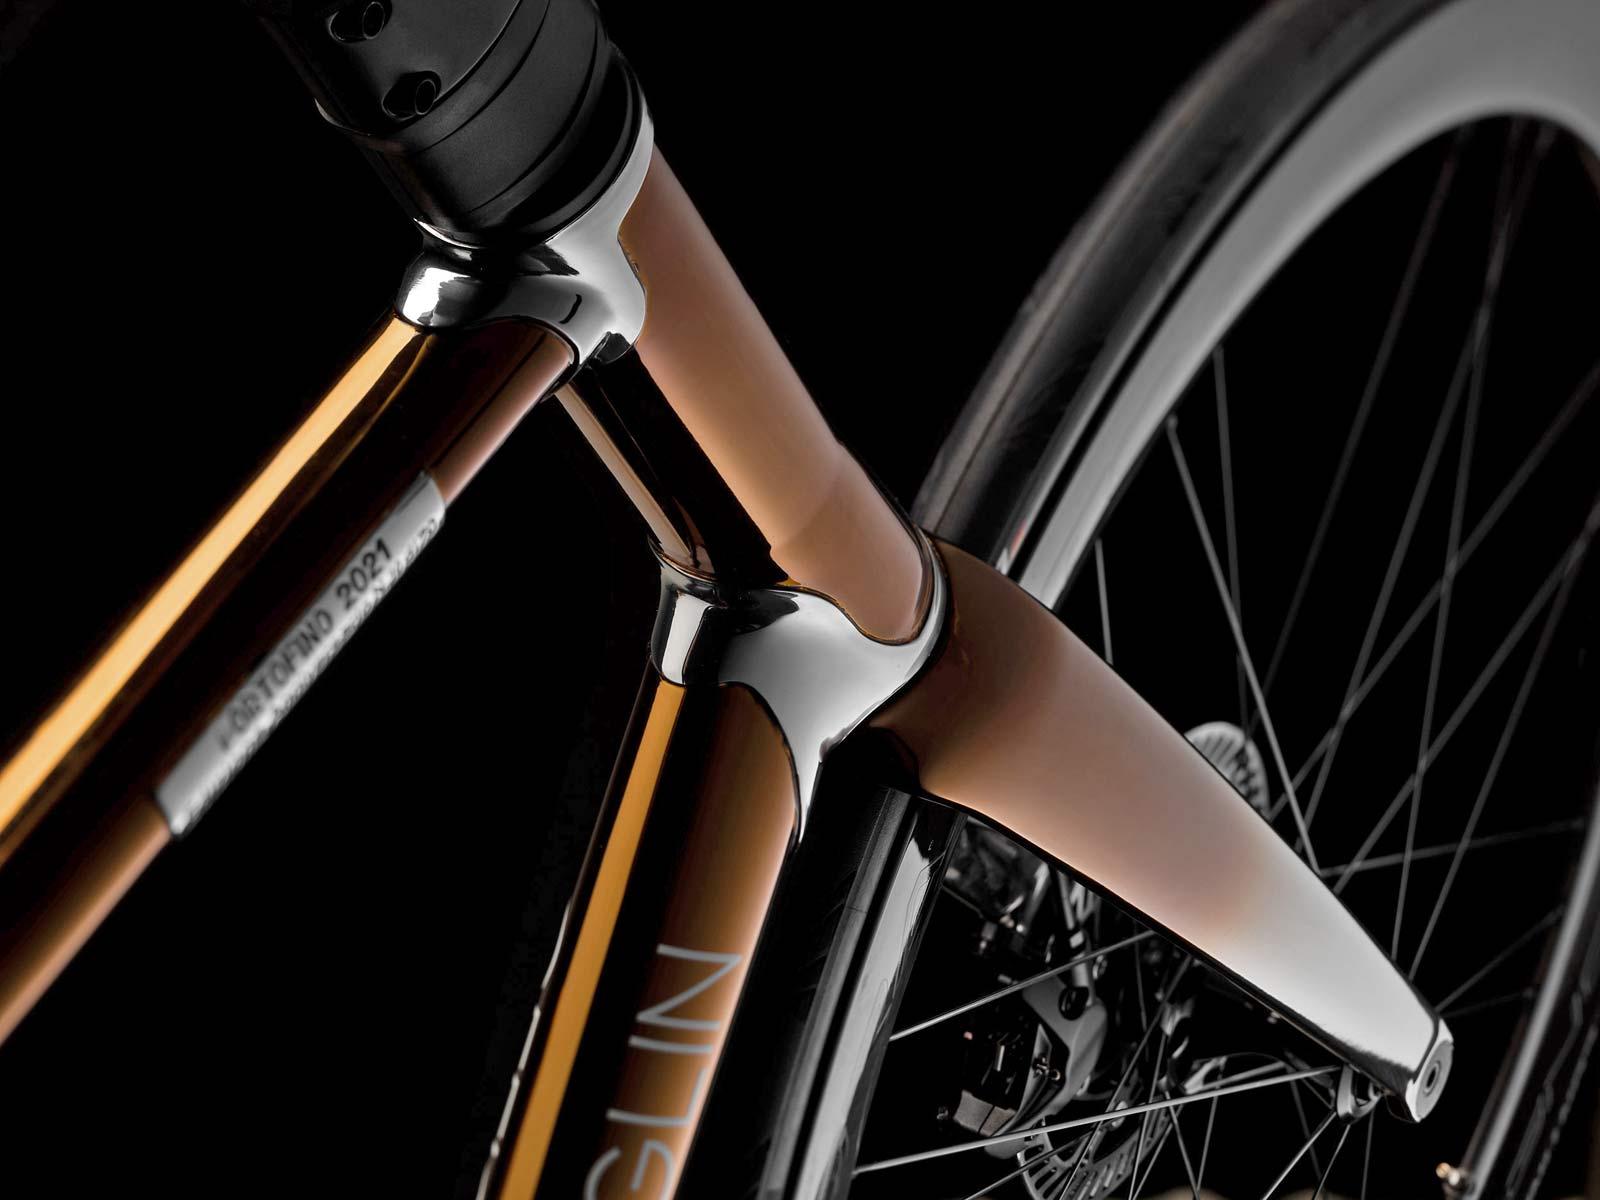 2021 Battaglin Portofino Edizione Anniversario road bike, handmade Italian modern lugged steel road bike with full internal routing,headtube